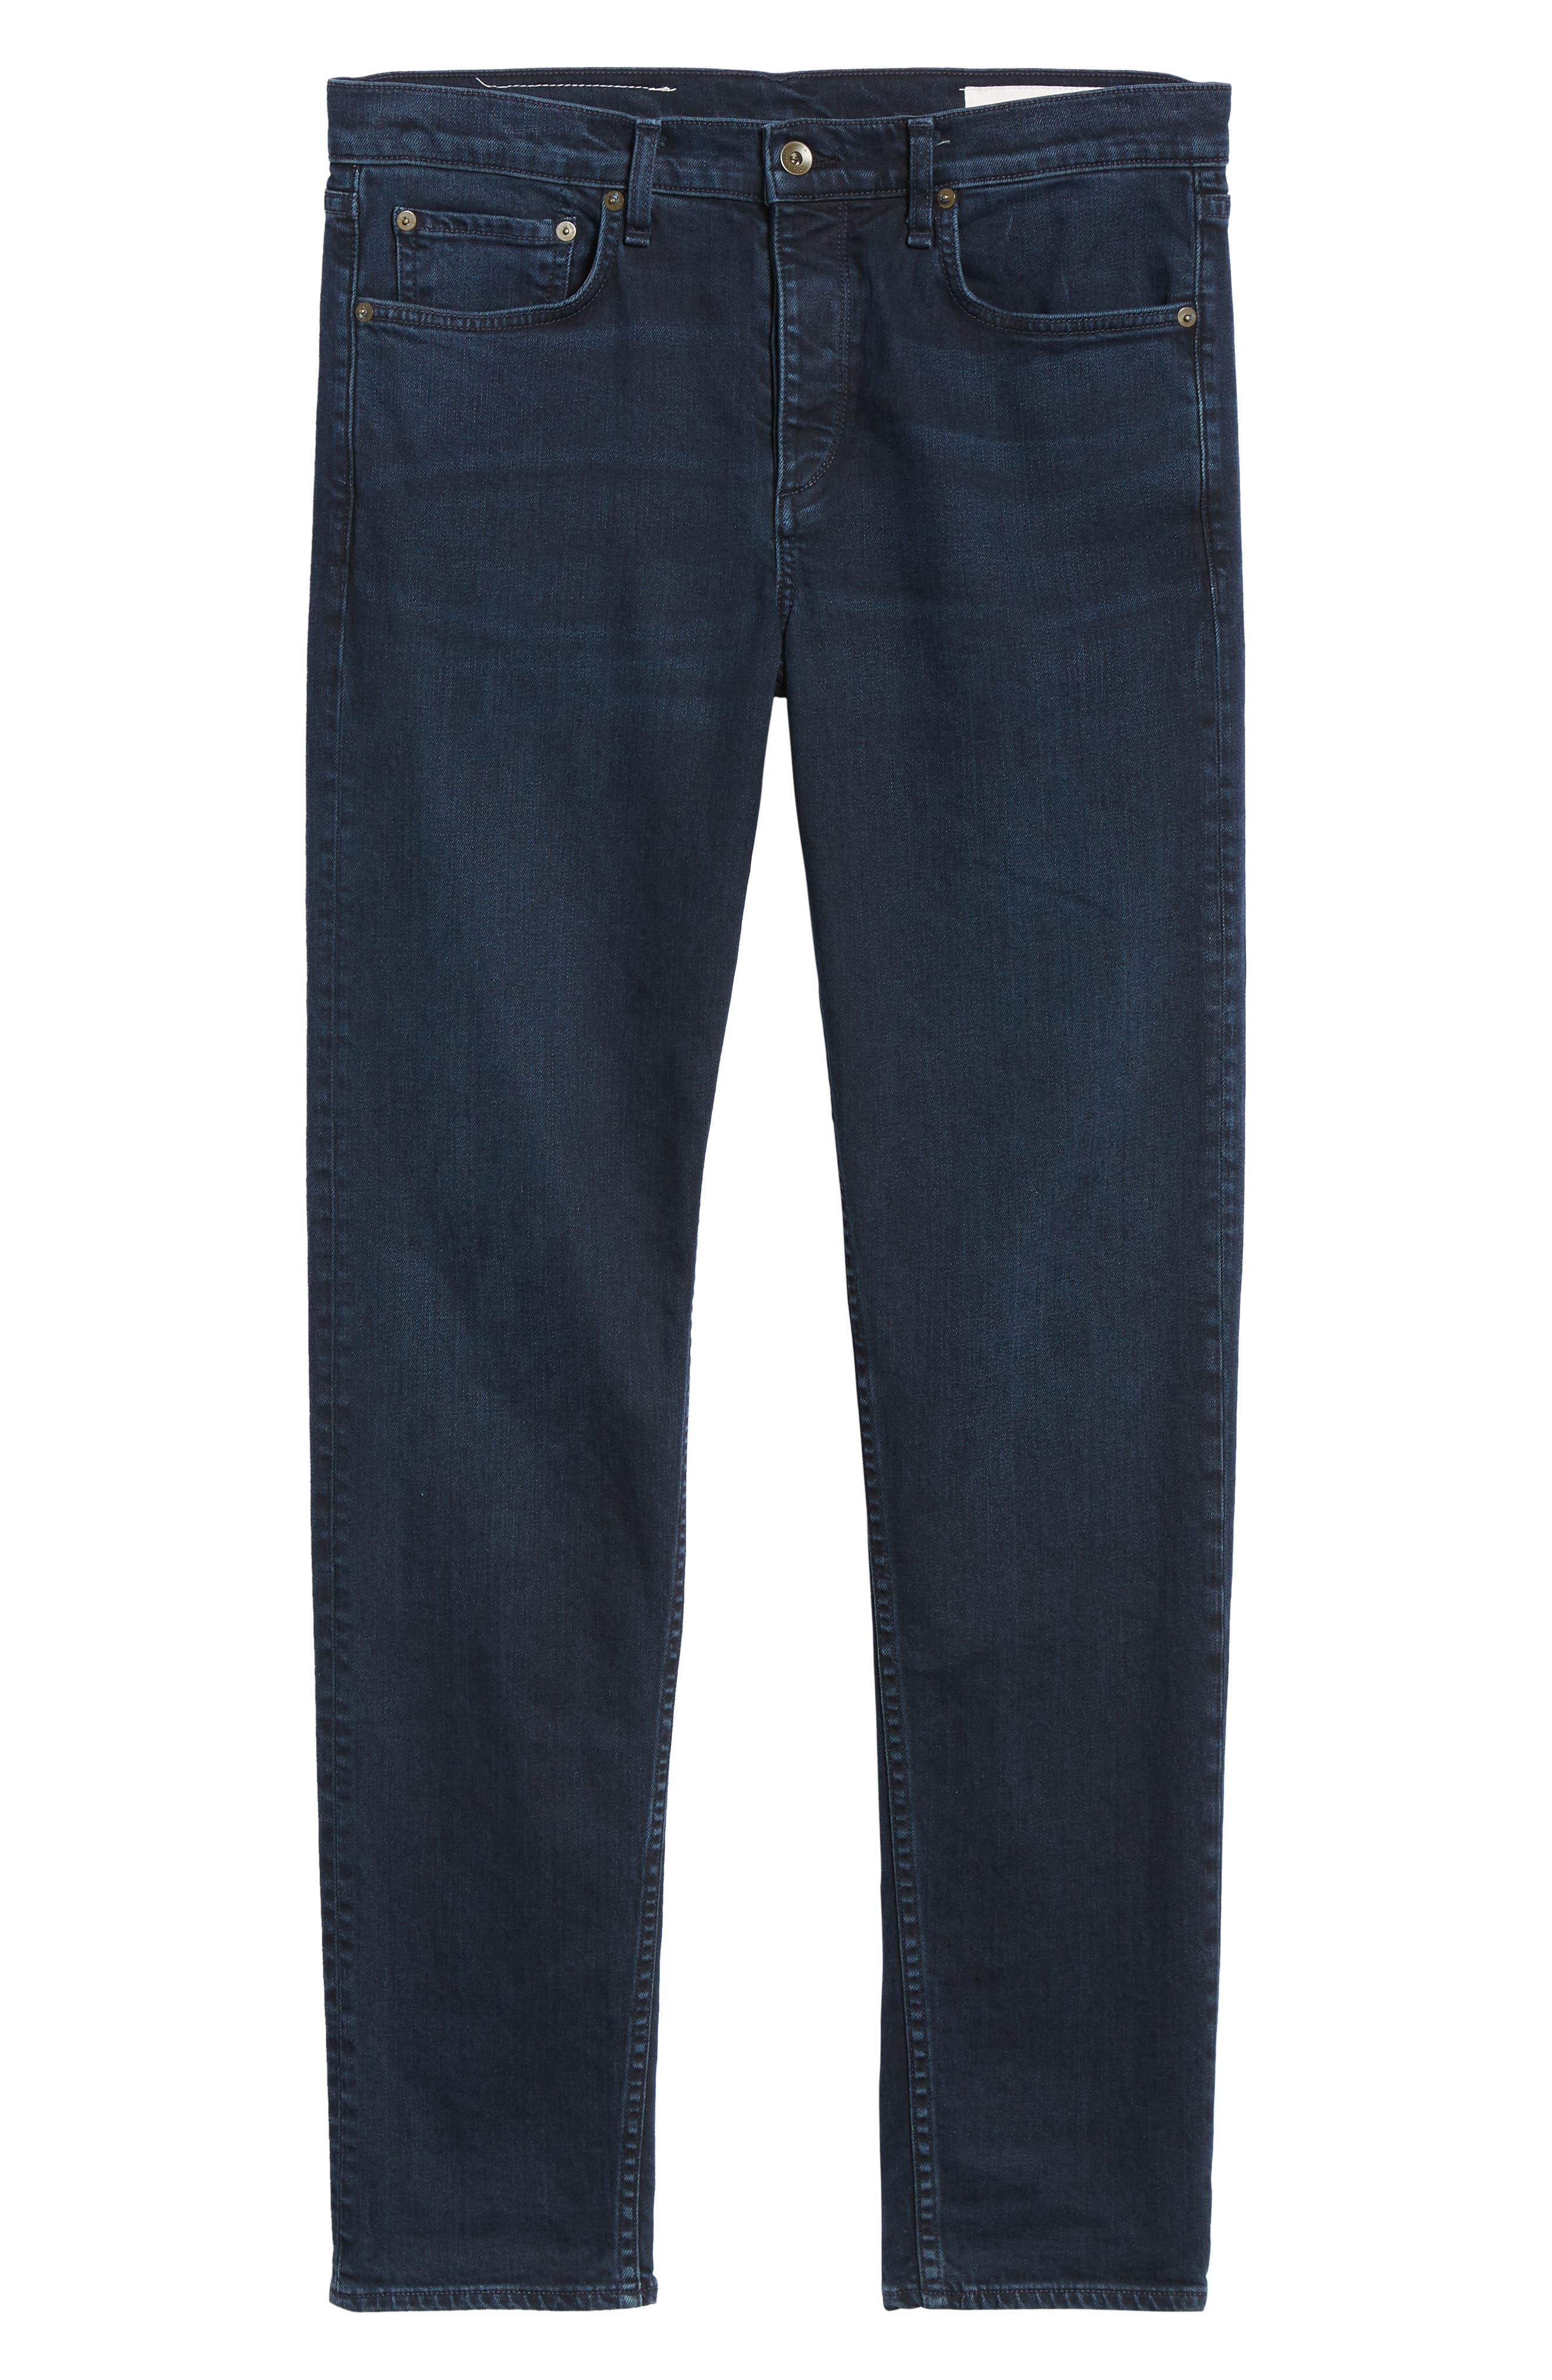 Fit 3 Slim Straight Leg Jeans,                             Alternate thumbnail 6, color,                             BAYVIEW